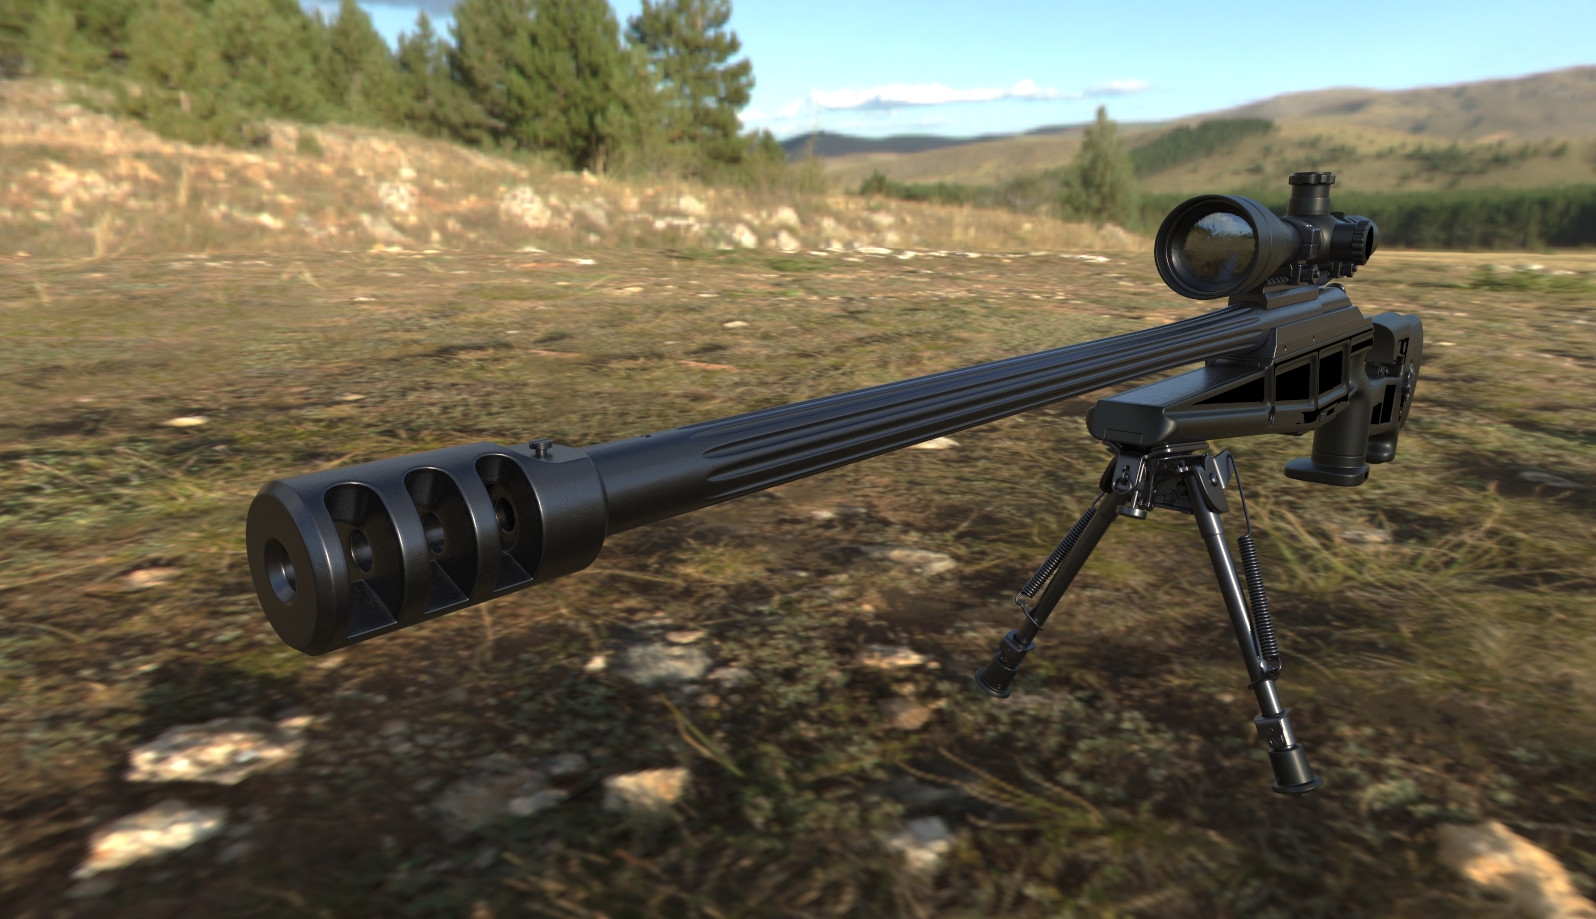 David stingl r93 sniper rifle